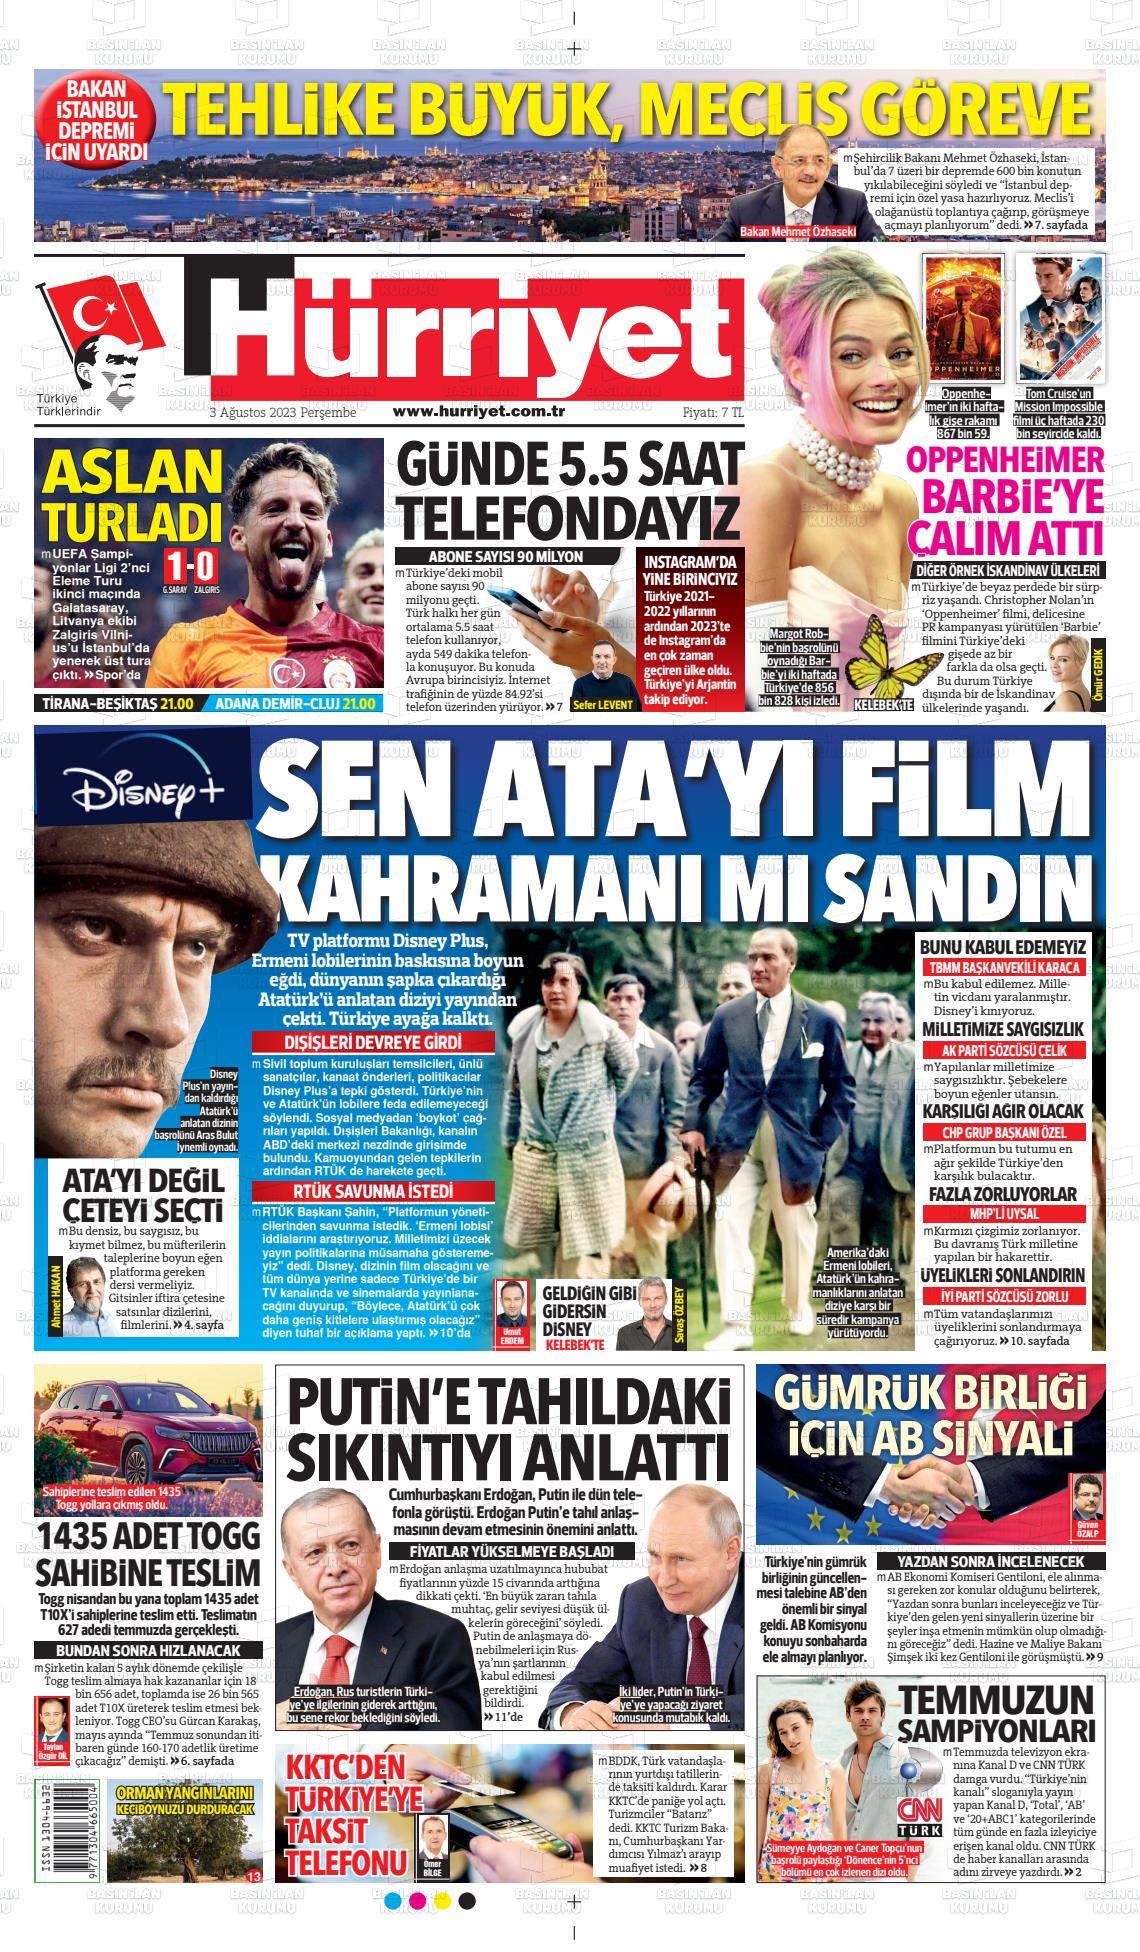 20 Ocak 2019, Pazar hurriyet Gazetesi